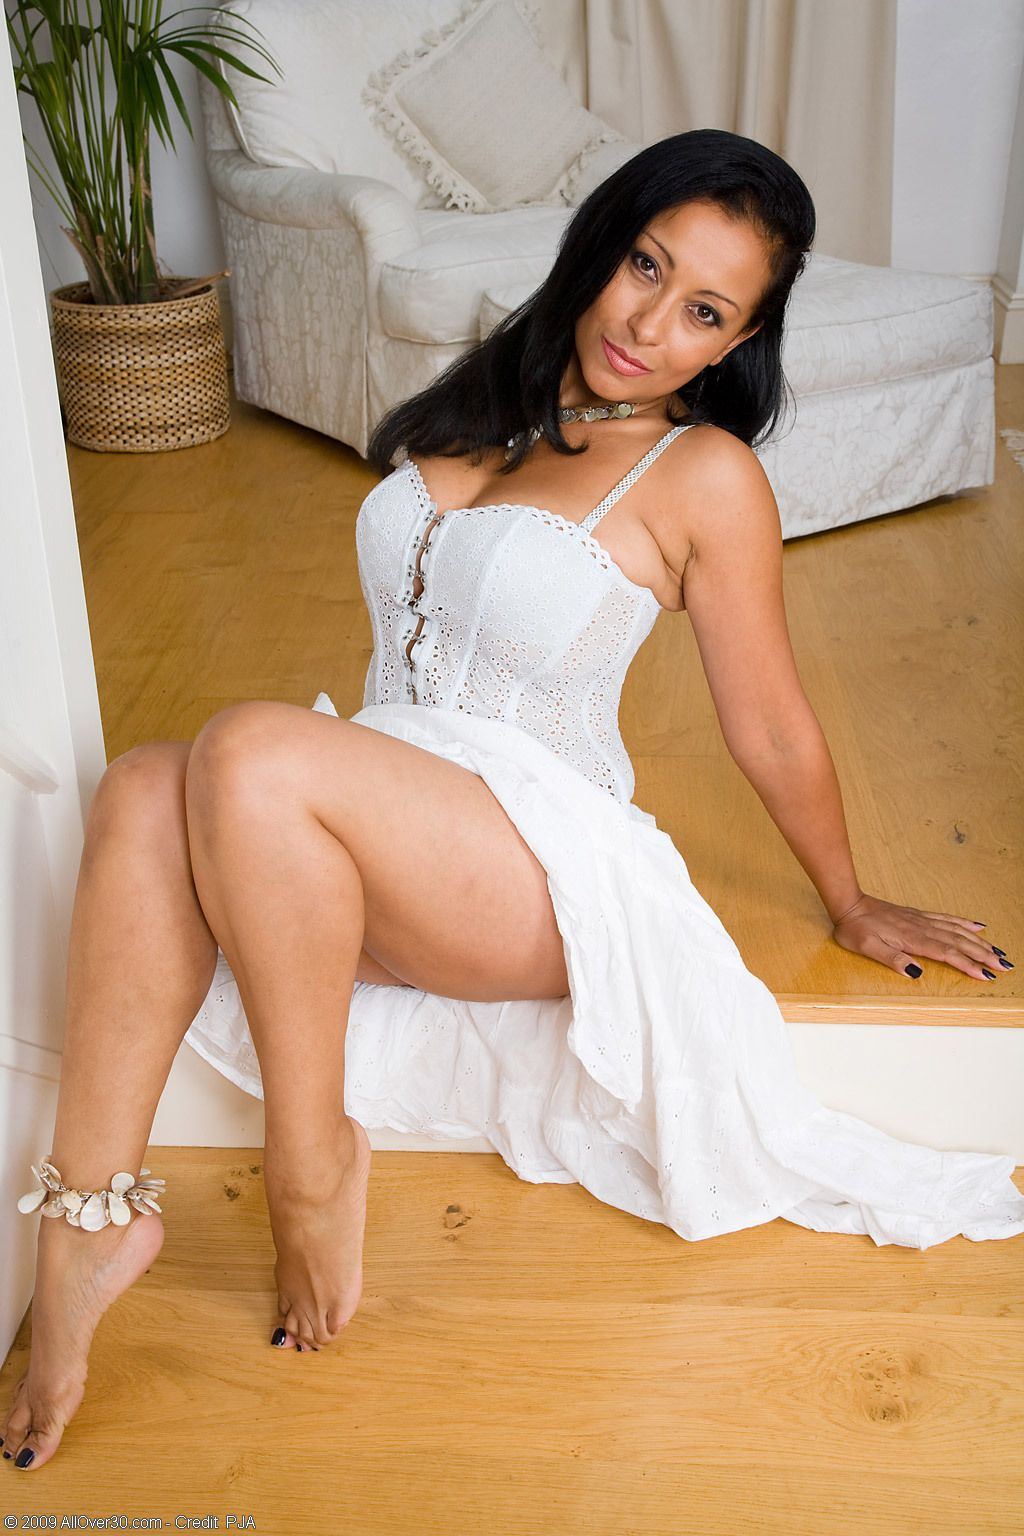 image Donna ambrose aka danica collins feeling horny